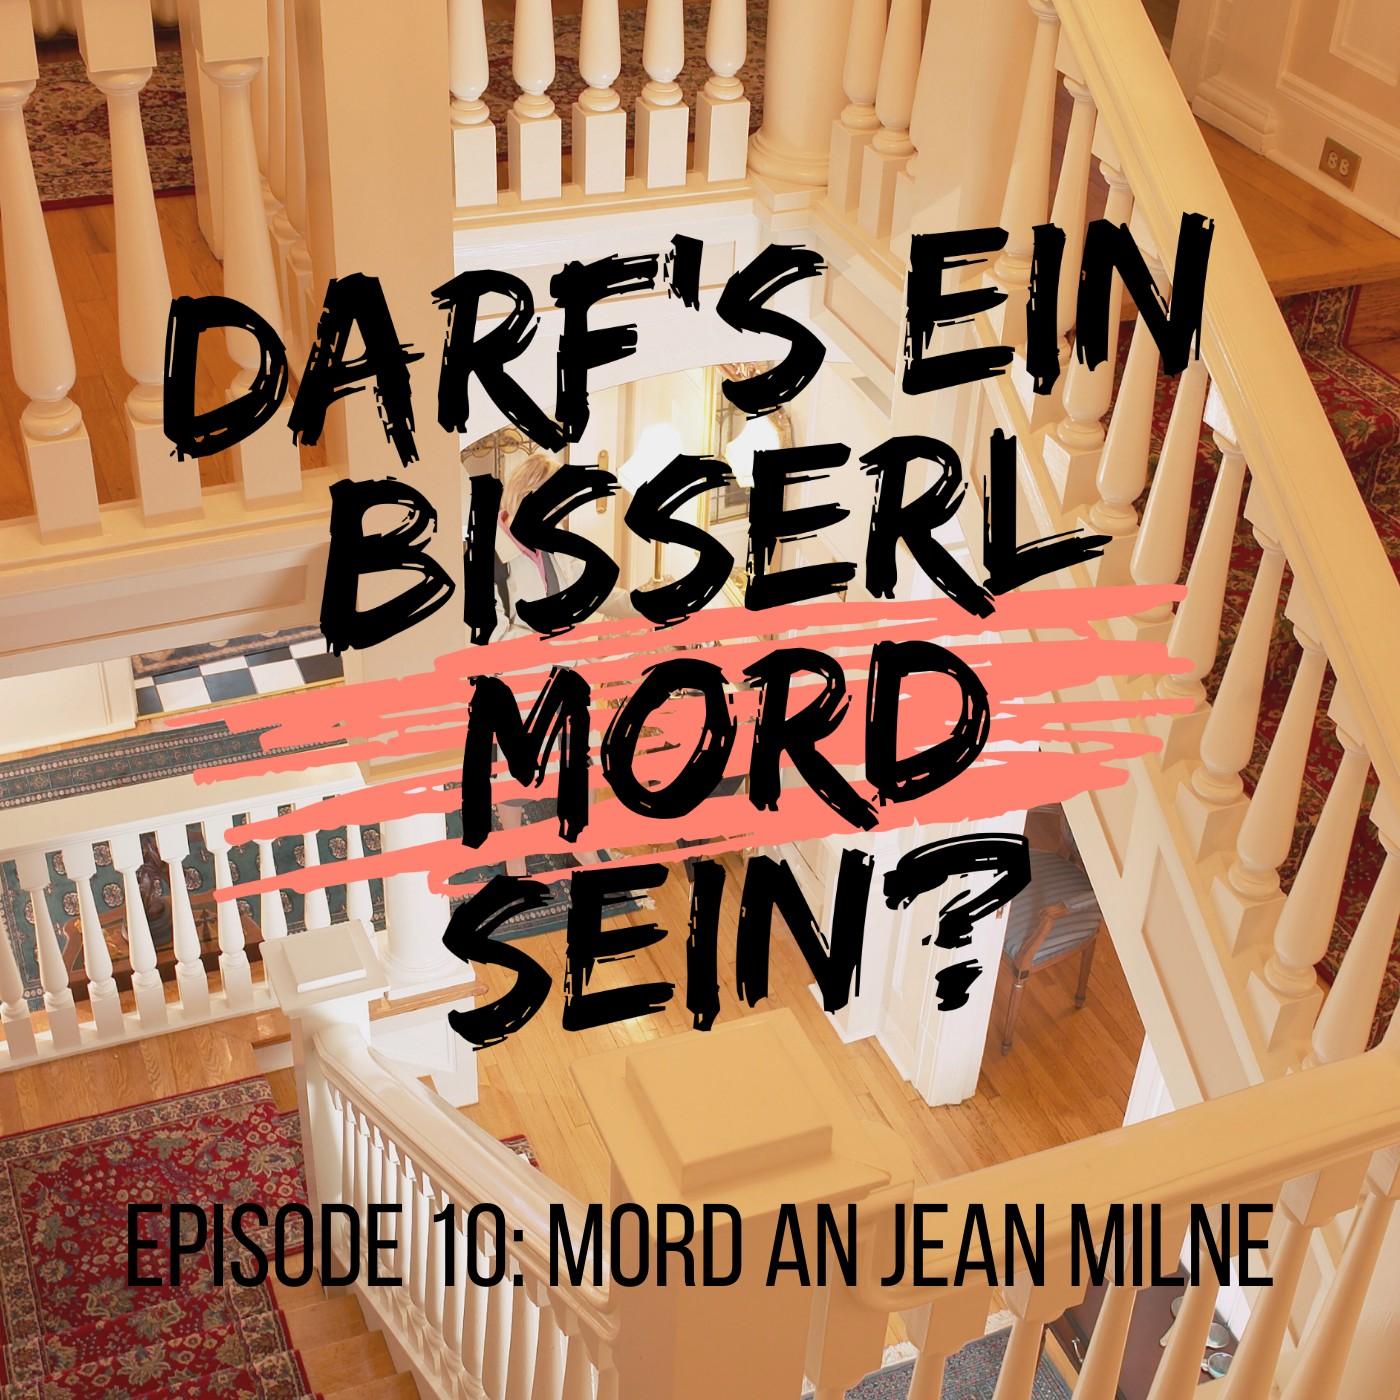 Episode 10: Mord an Jean Milne - UNGELÖST